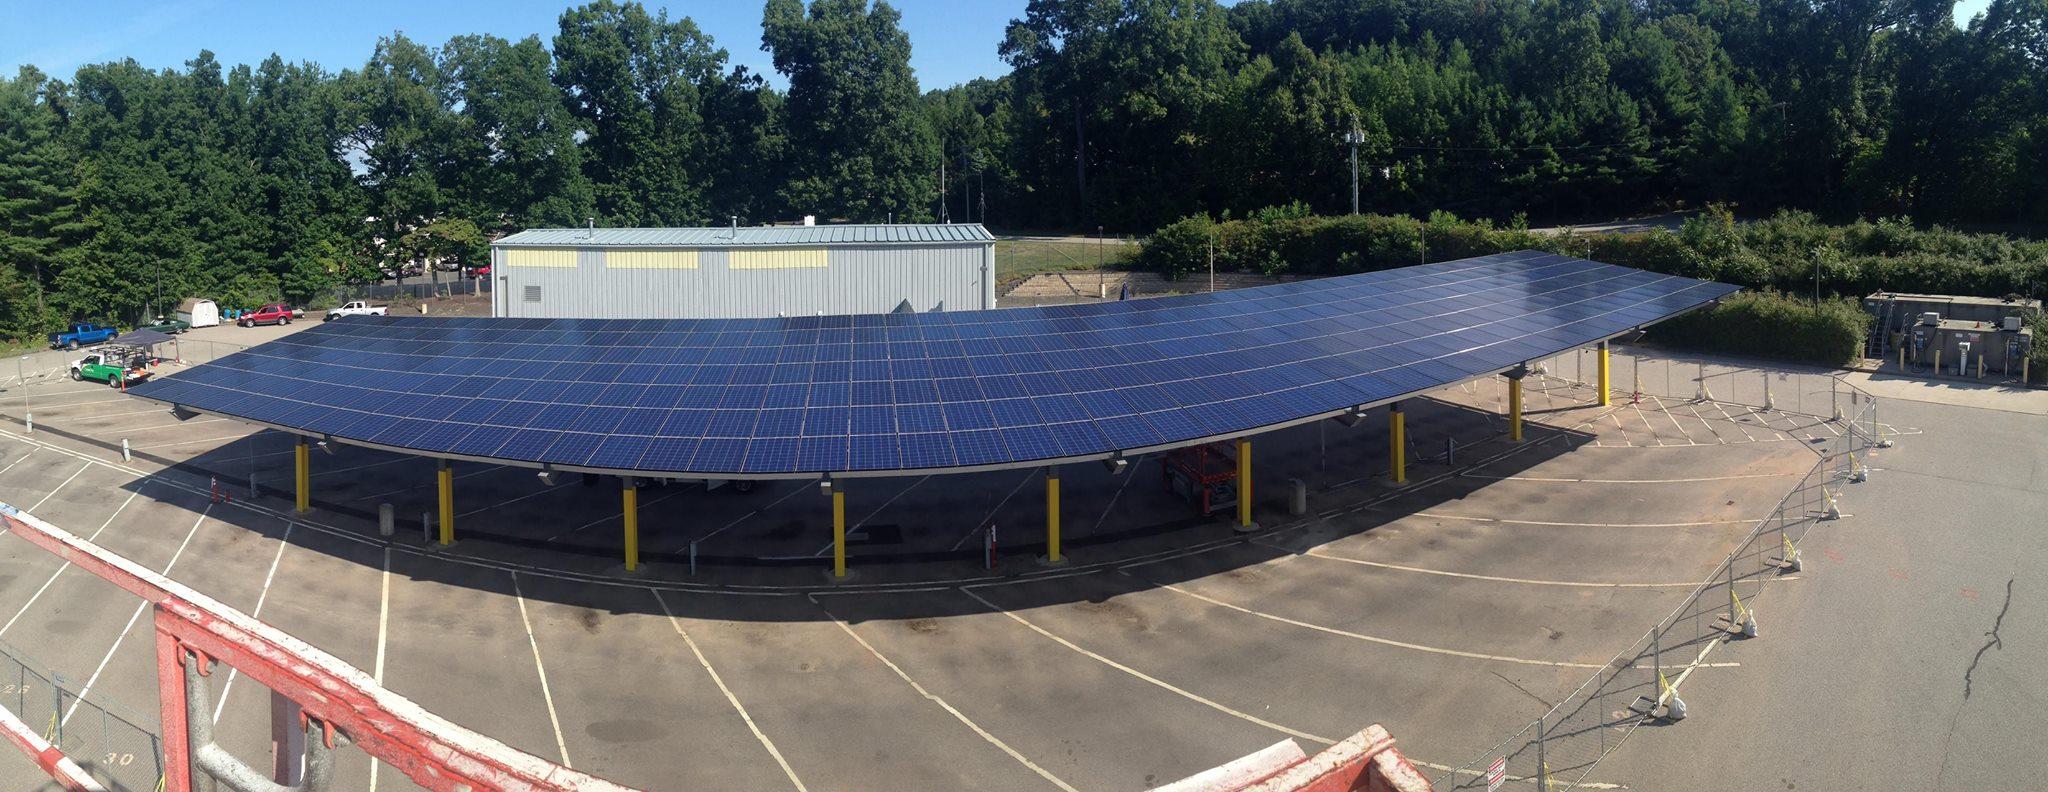 Solar Pannel Installation